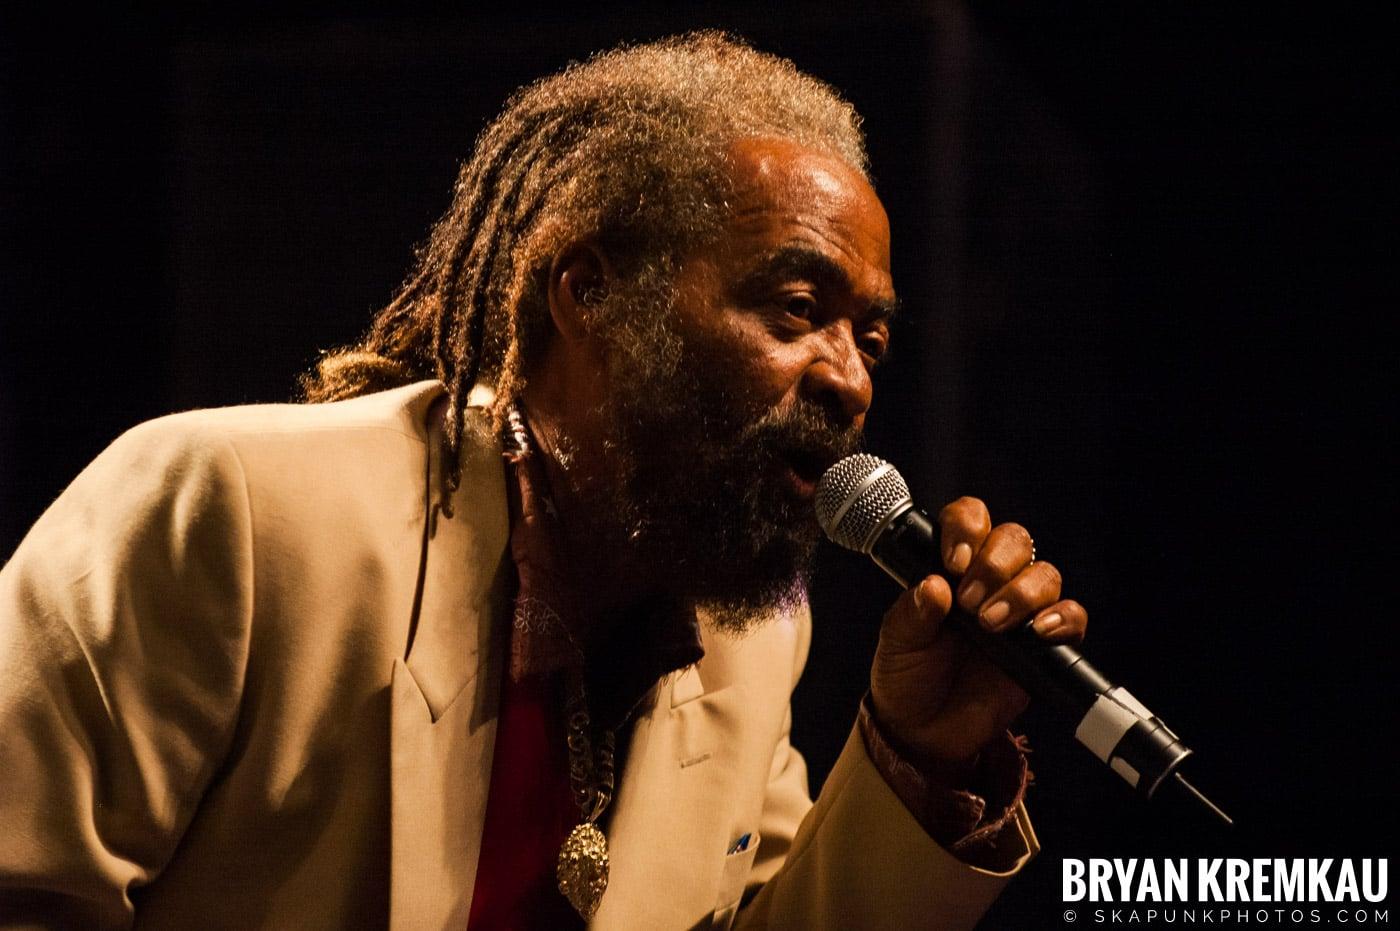 John Holt @ Vintage Reggae Fest - Hammerstein Ballroom, NYC - 12.16.07 (1)